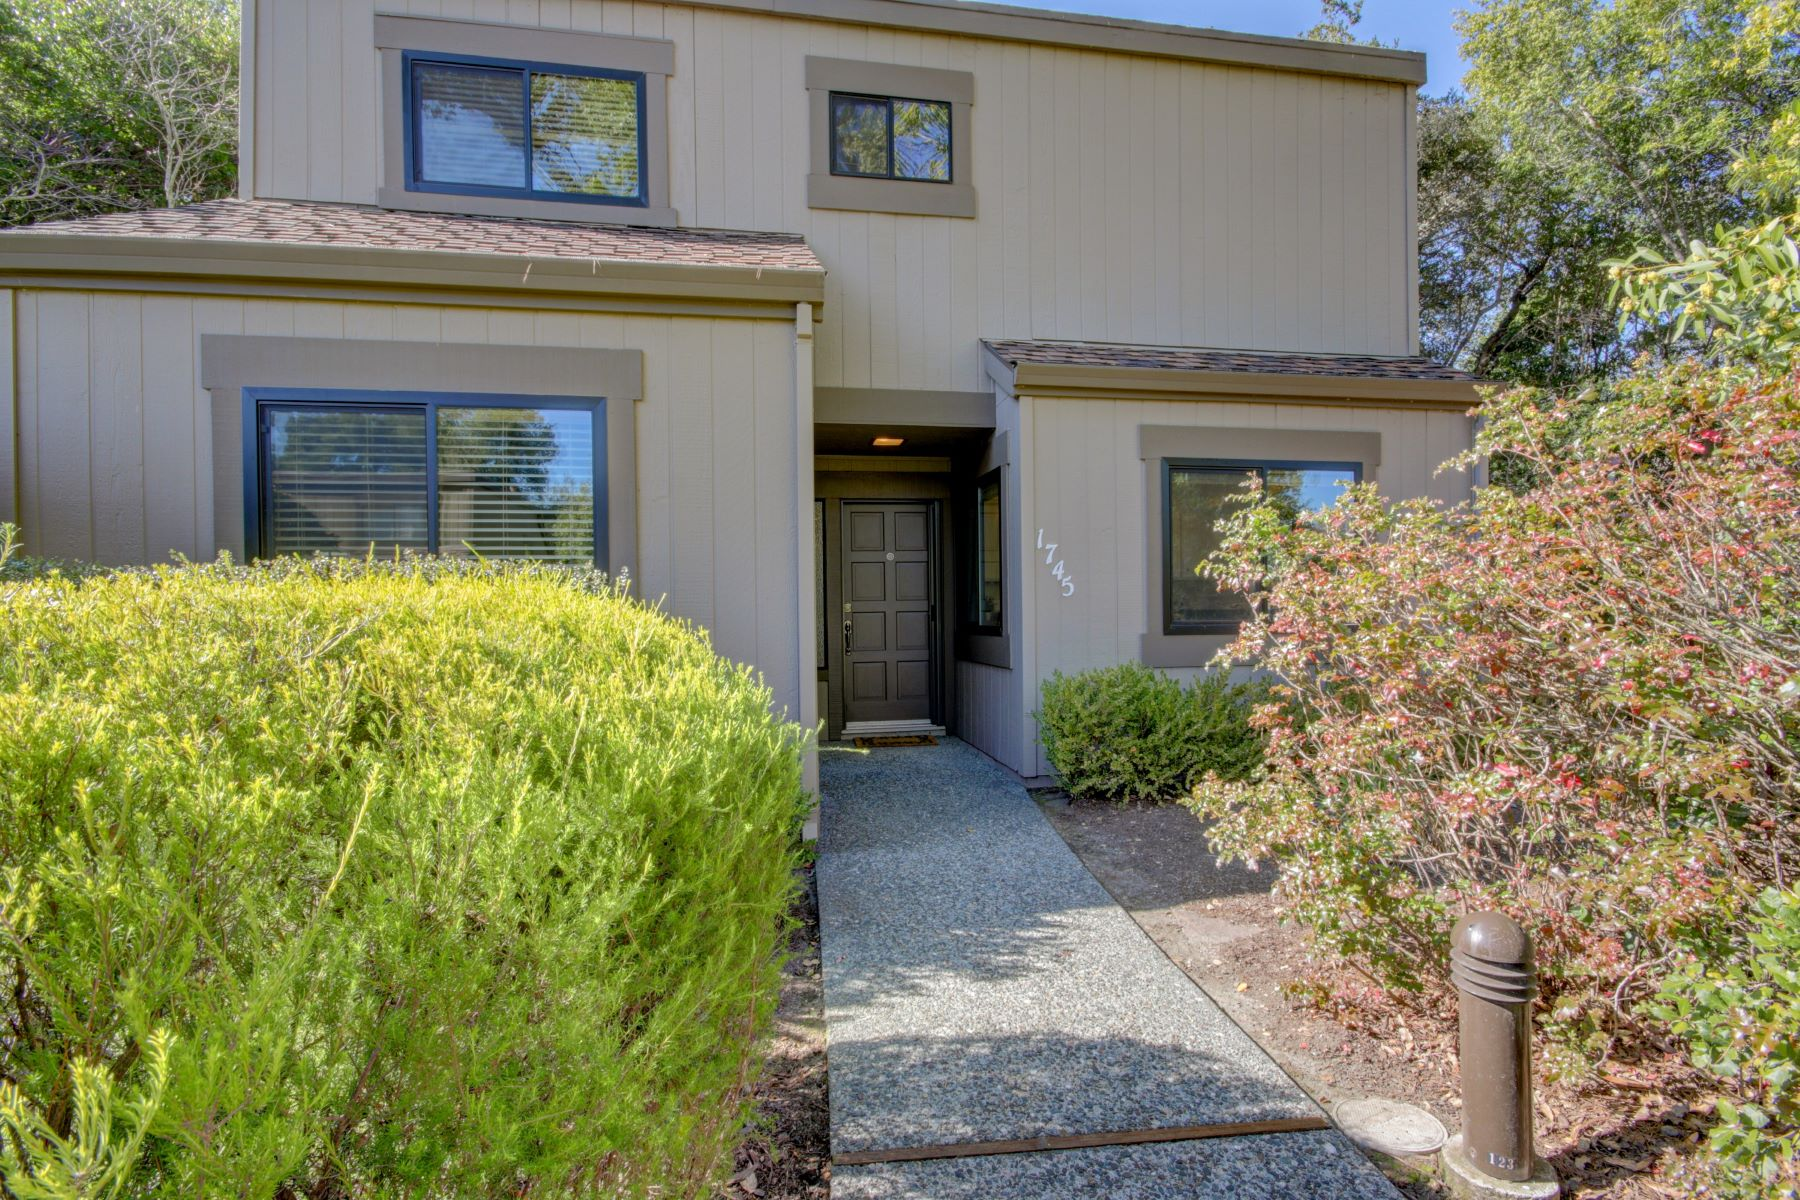 Condominiums for Sale at Sanctuary Setting 1745 Ignacio Blvd Novato, California 94949 United States